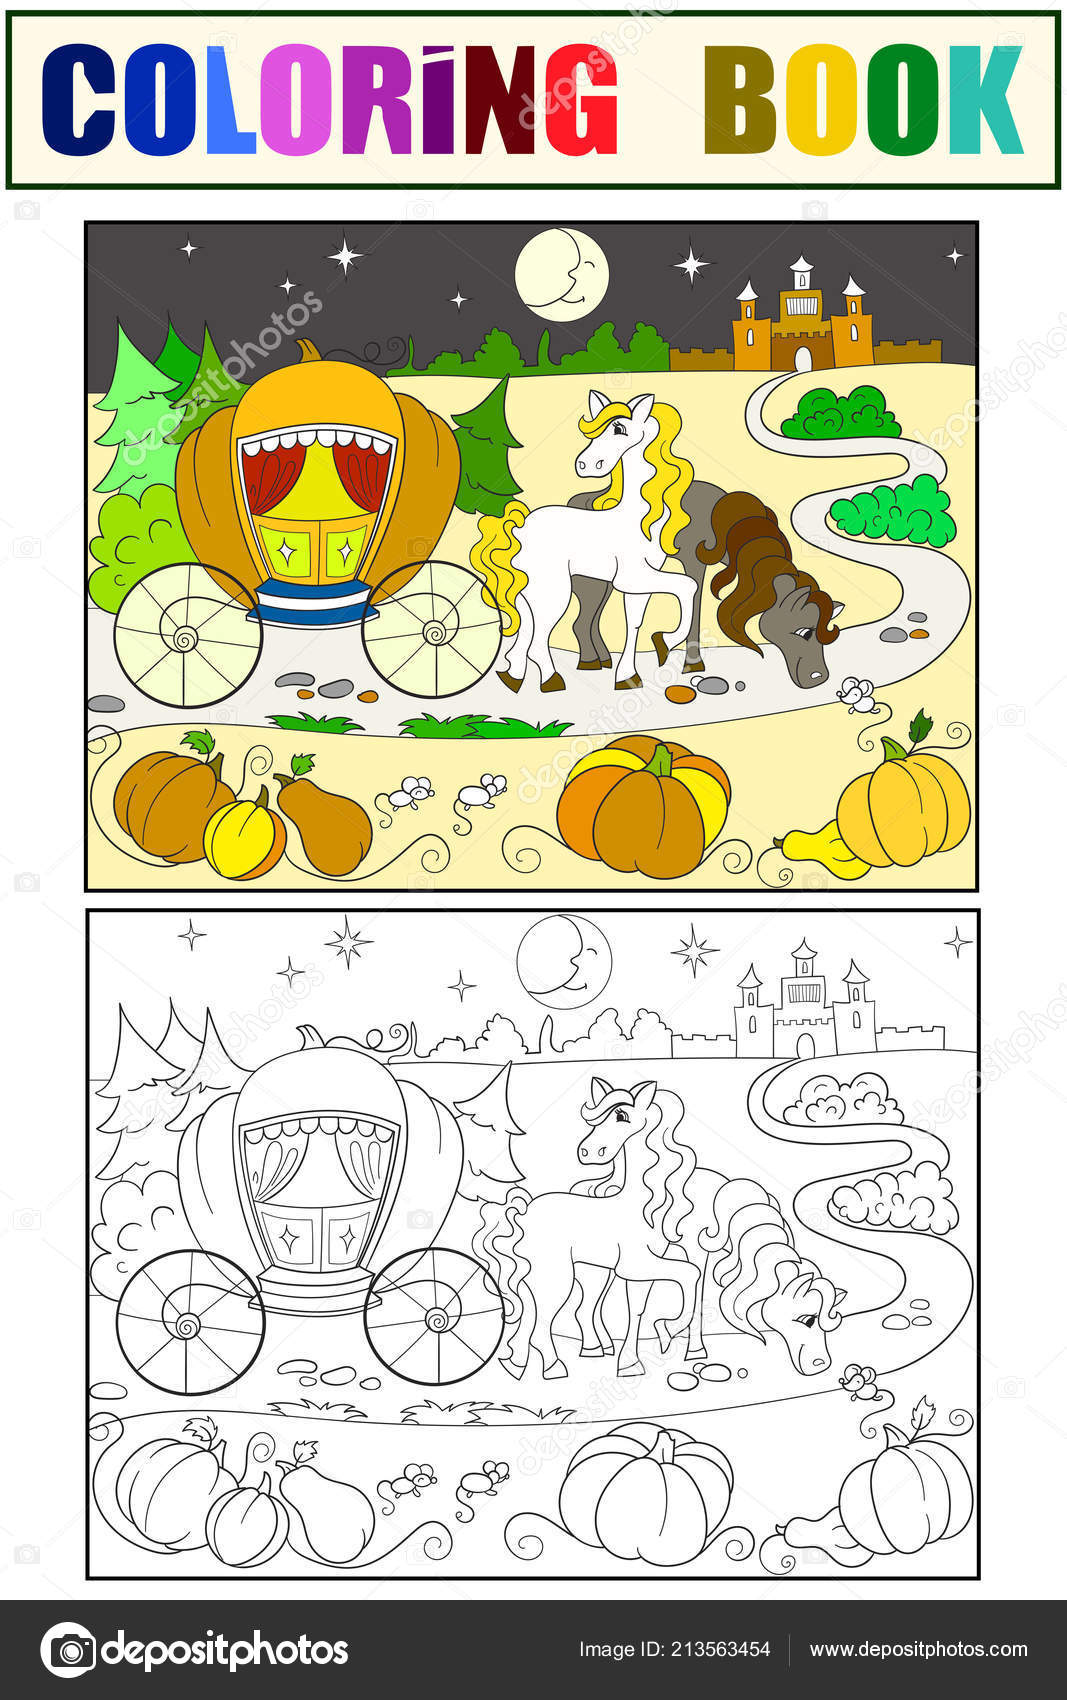 Cinderella fairy tale coloring book for children cartoon raster ...